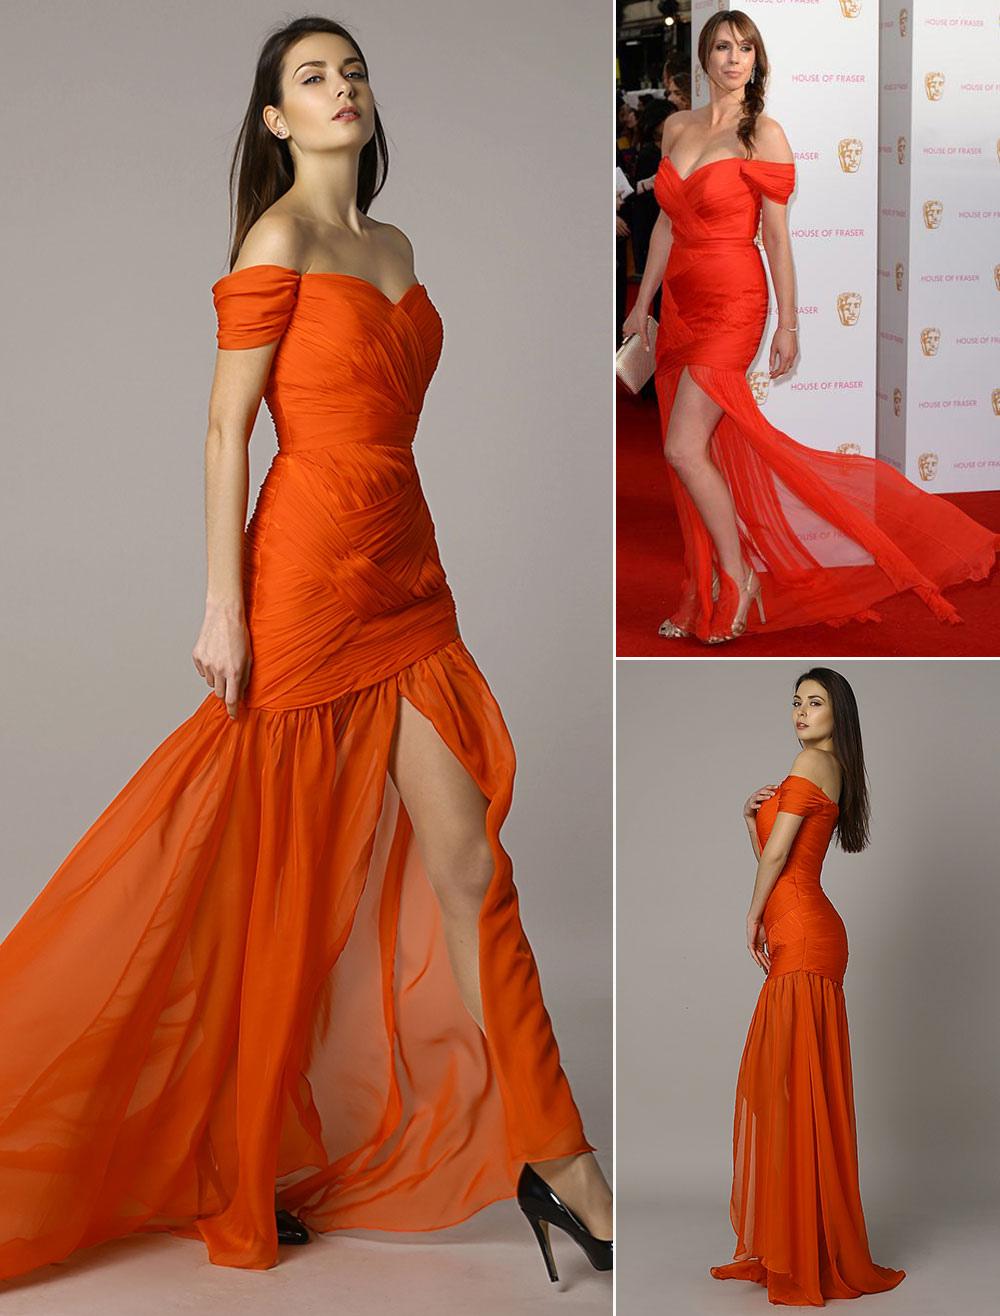 Red Carpet Replica Dresses Uk | Lixnet AG